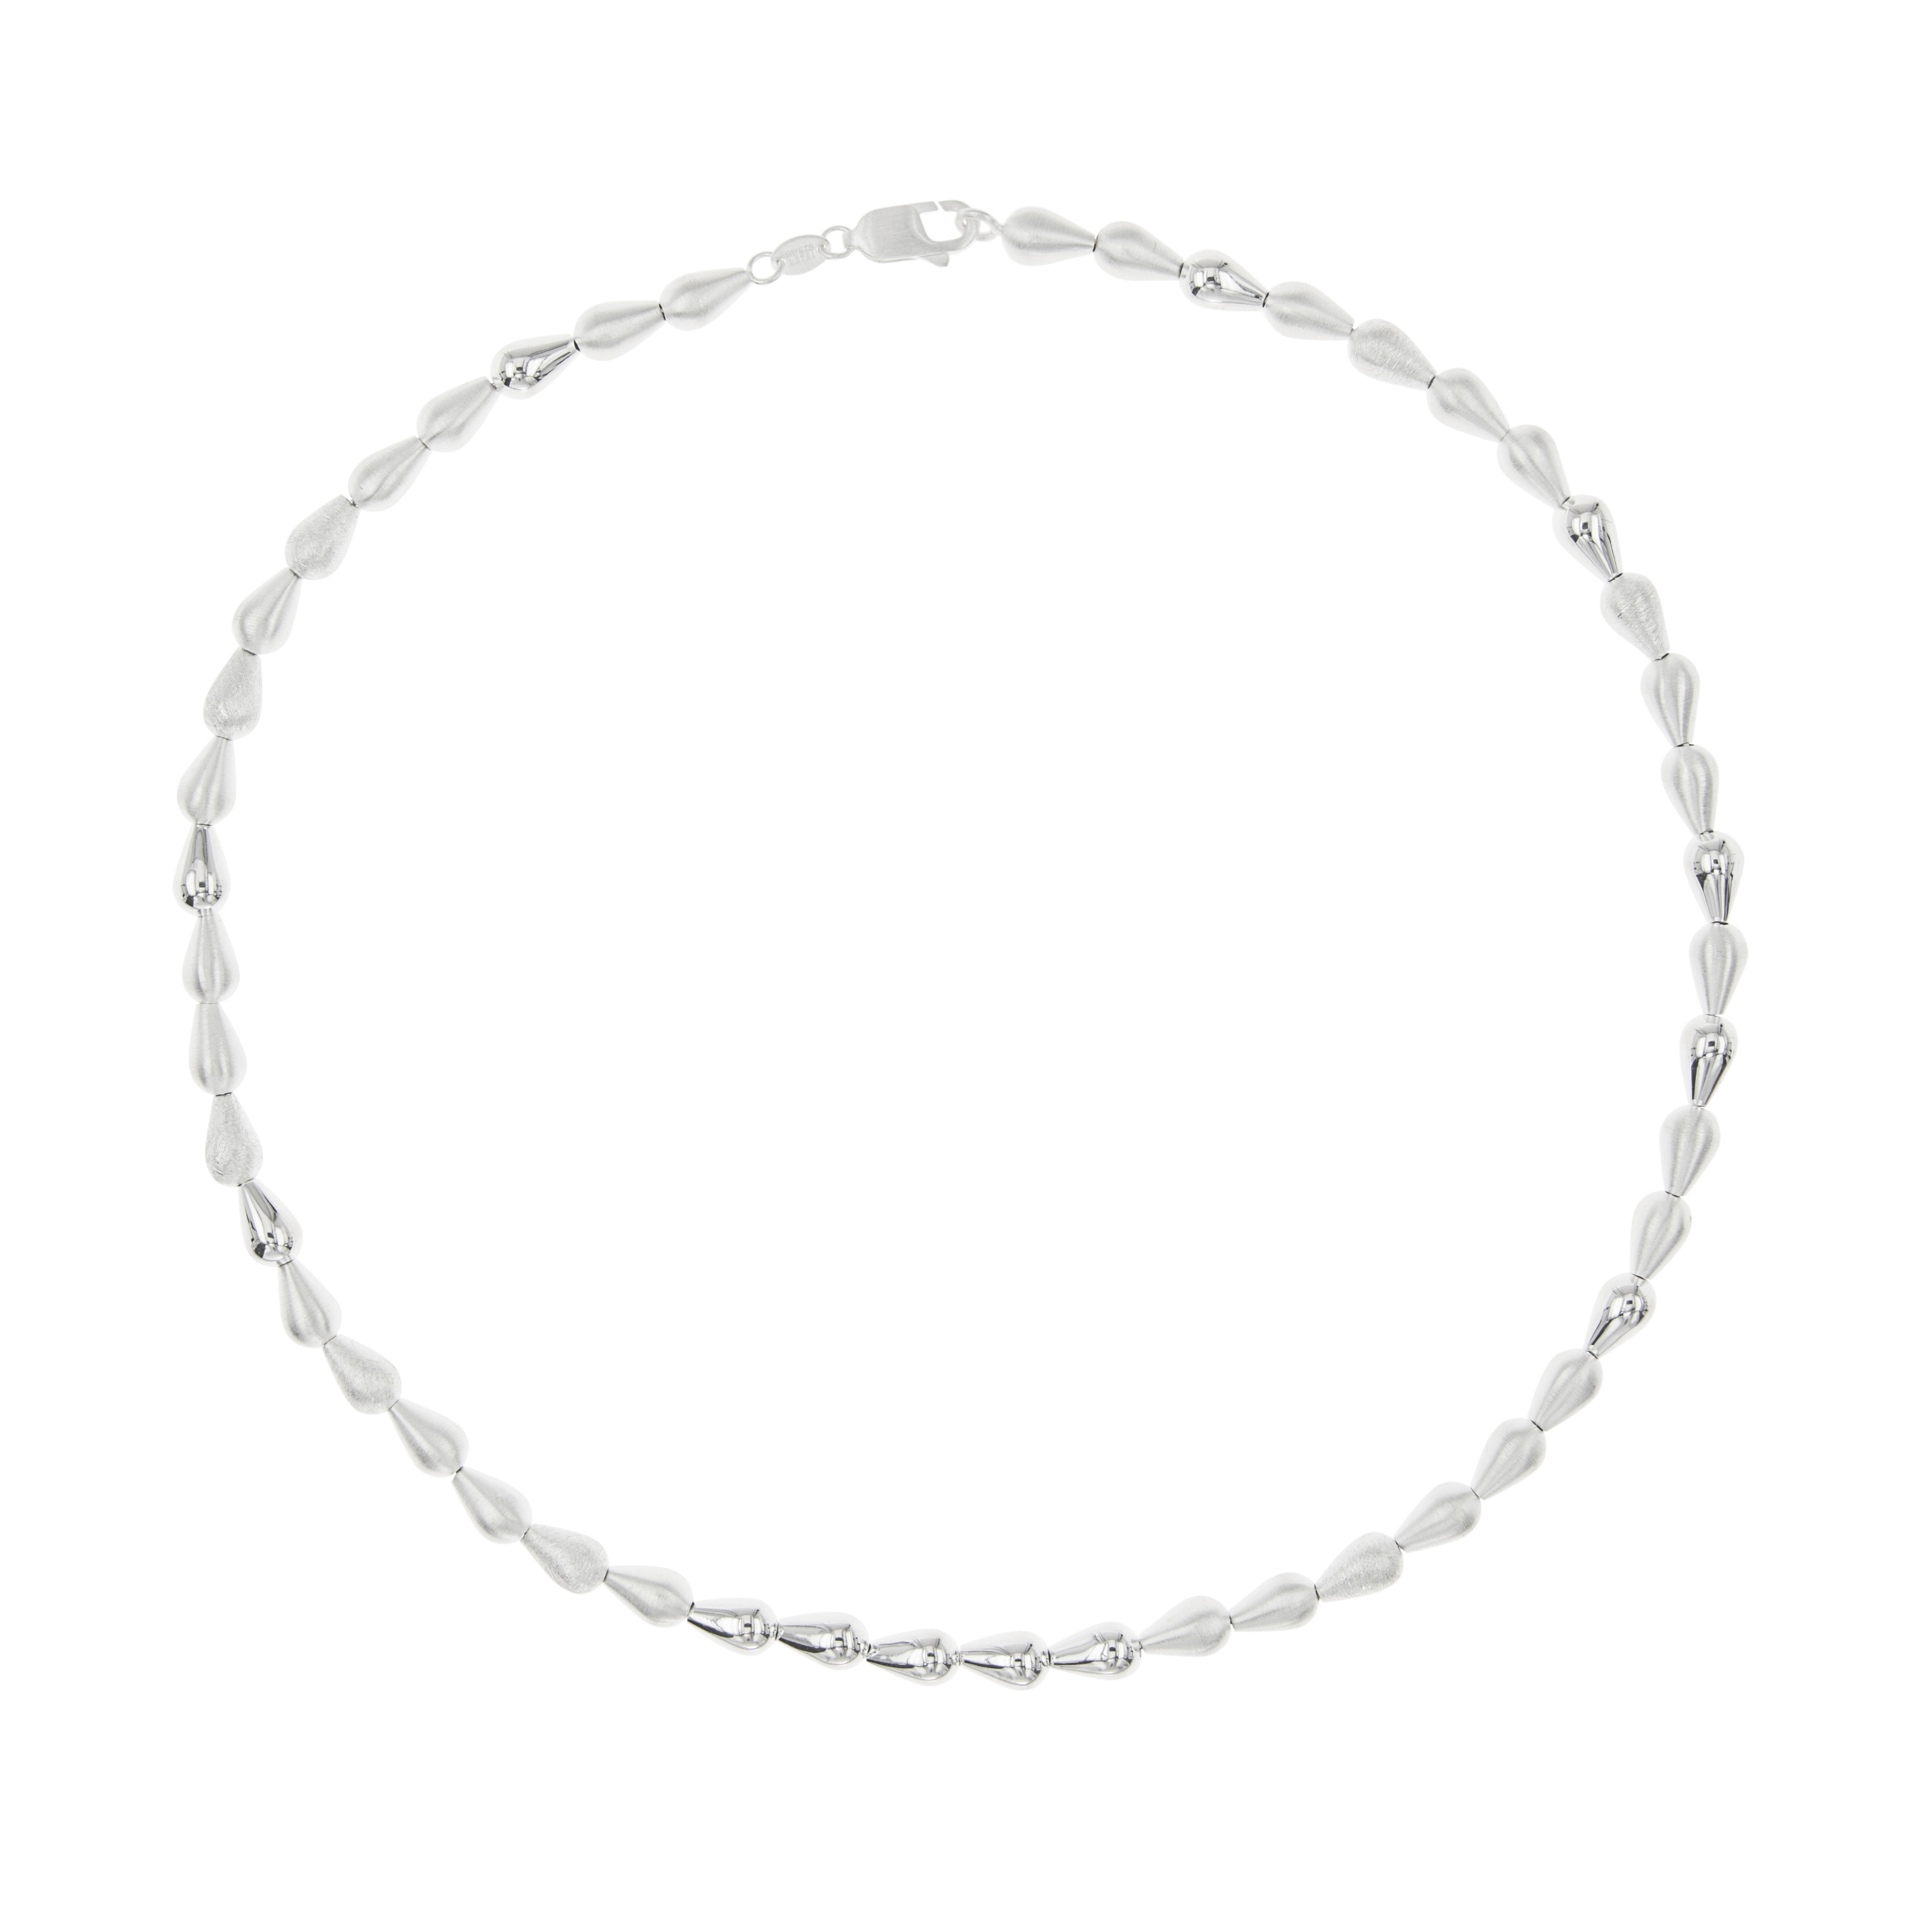 Tezer Textured Teardrop Necklace